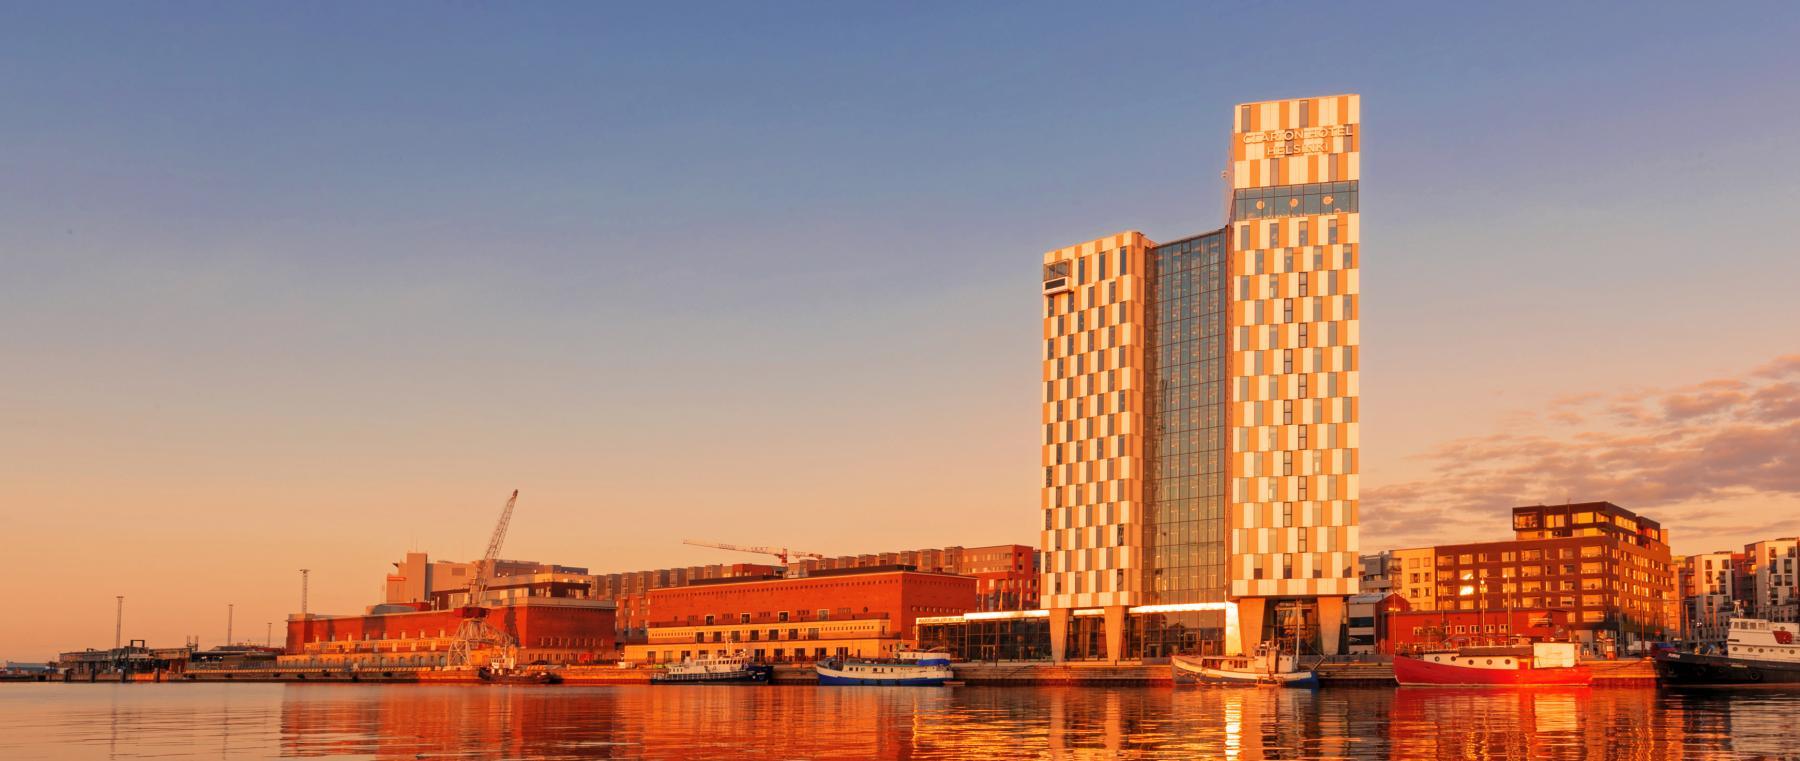 Helsinky Energy Challenge: i vincitori della sfida